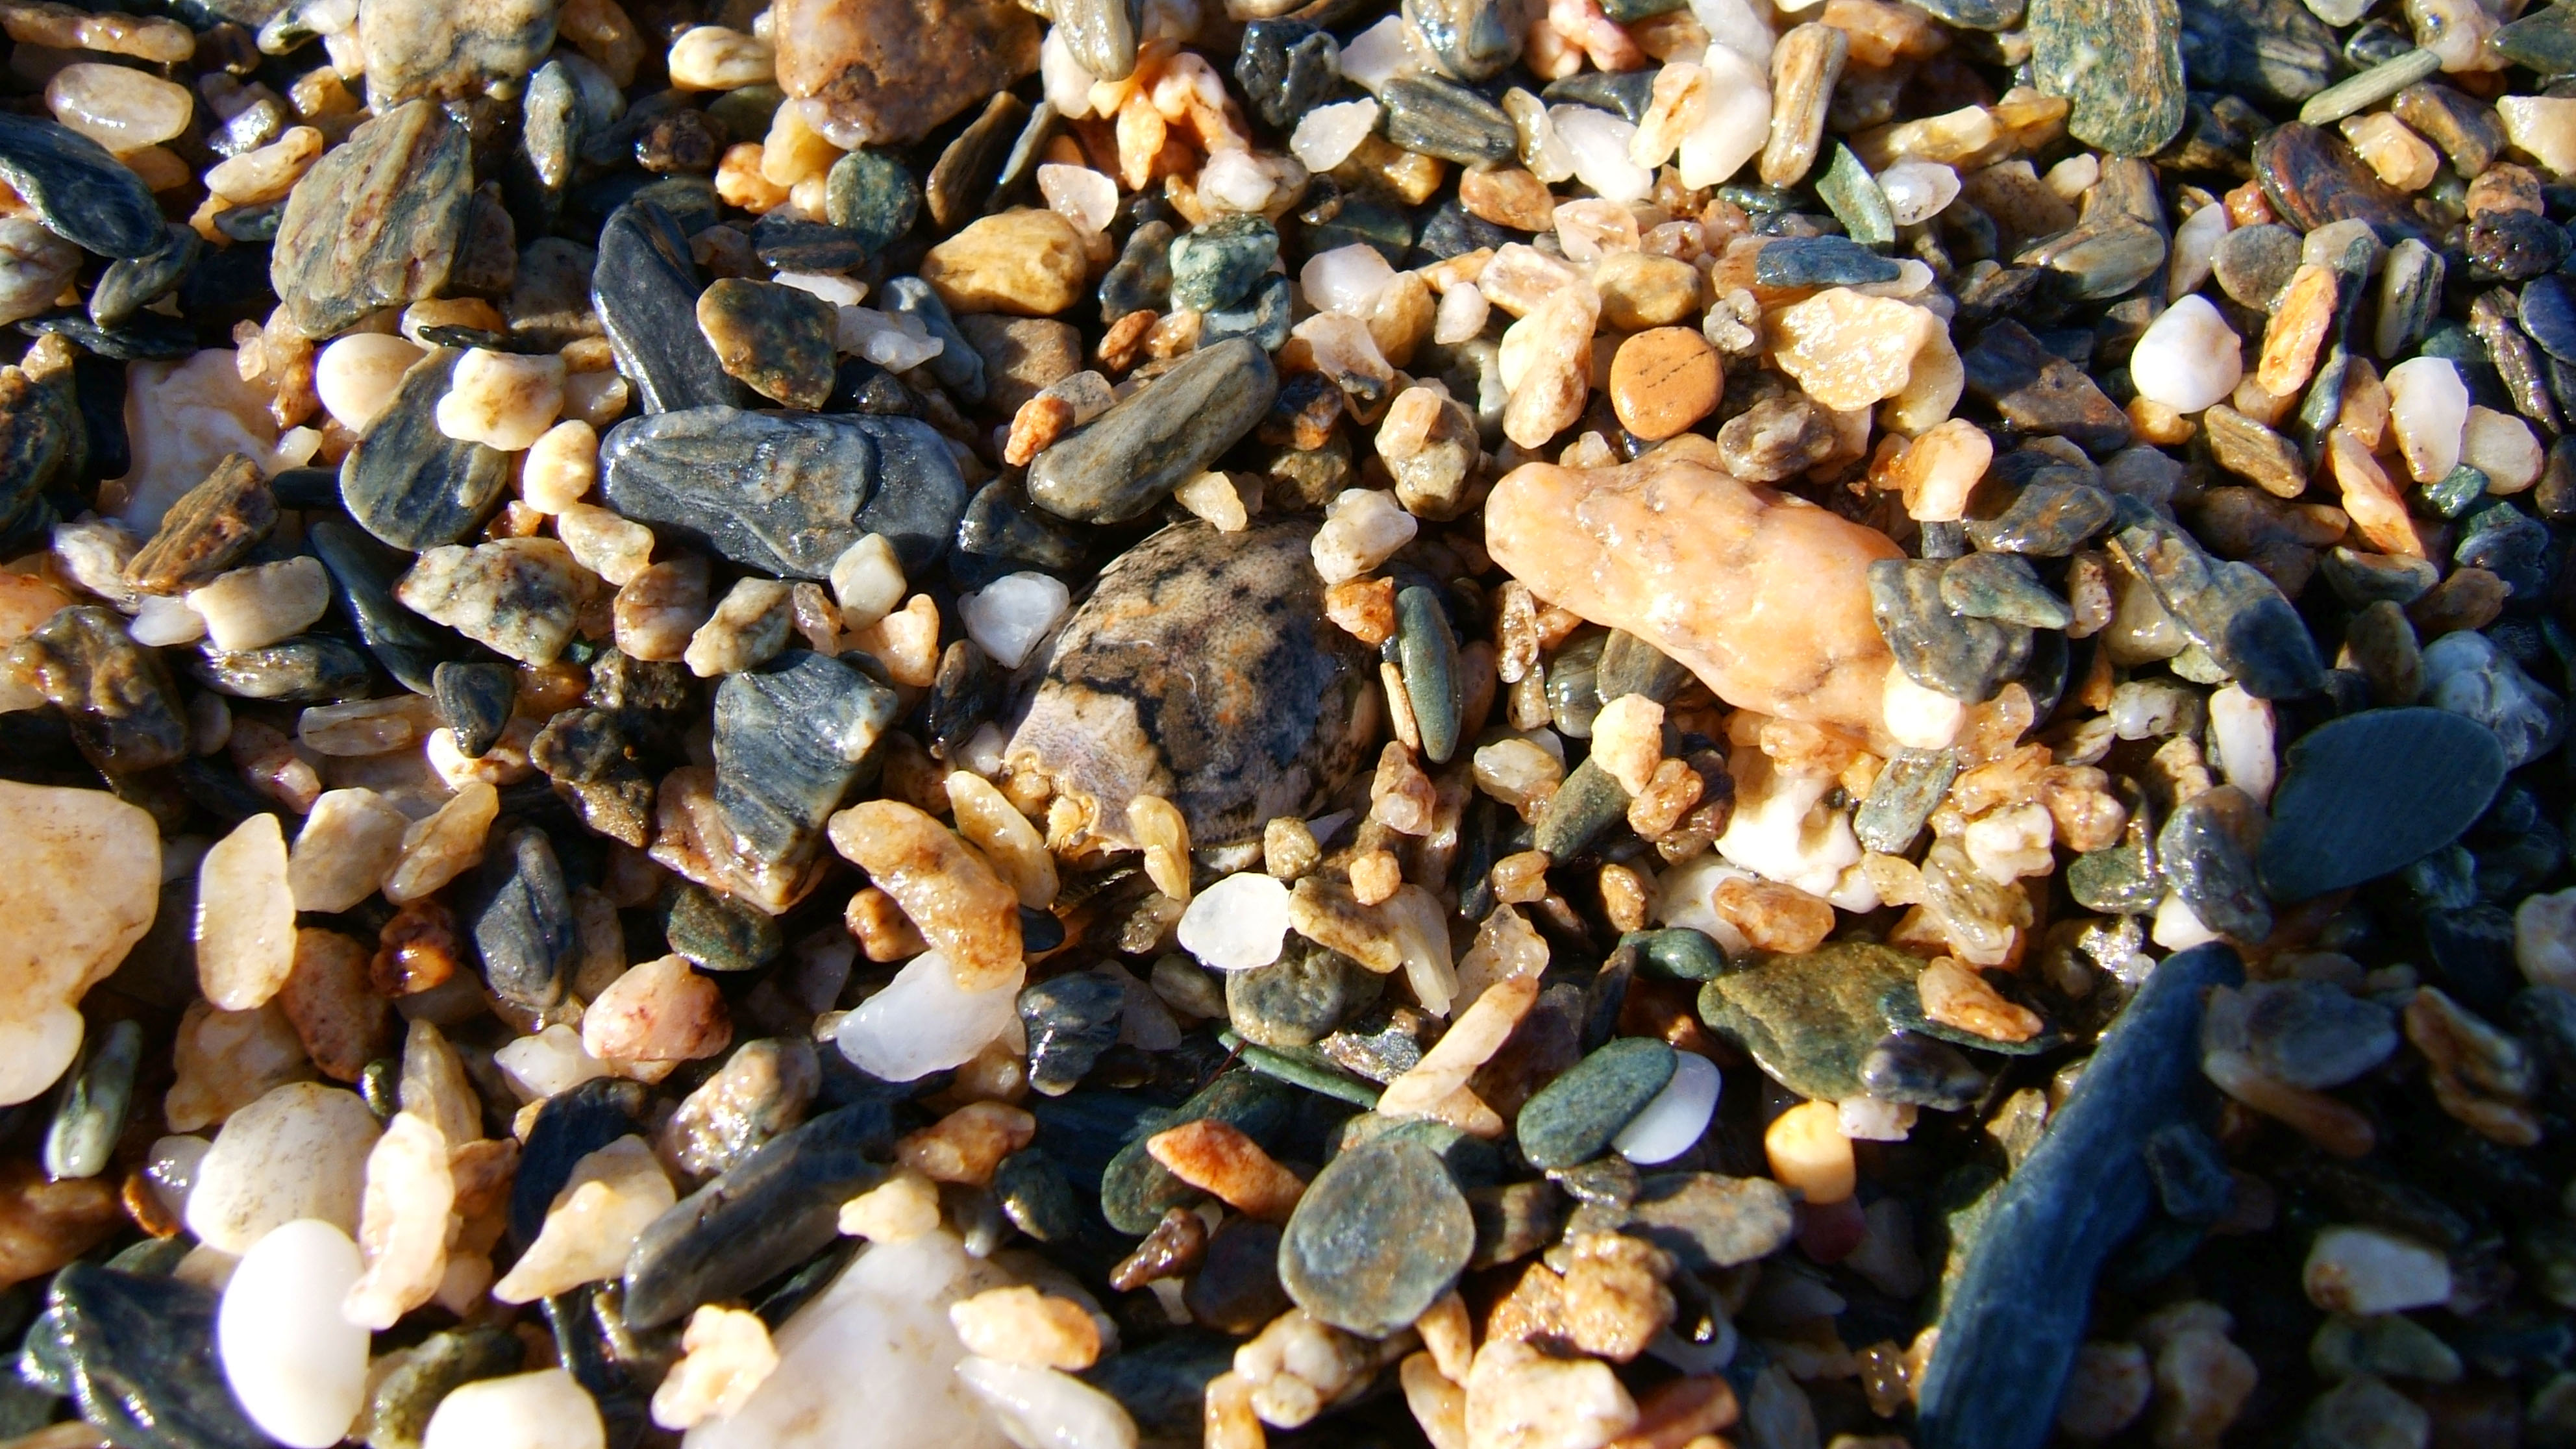 Textures Stones Pebbles Mindoro Tabinay Creatures 01